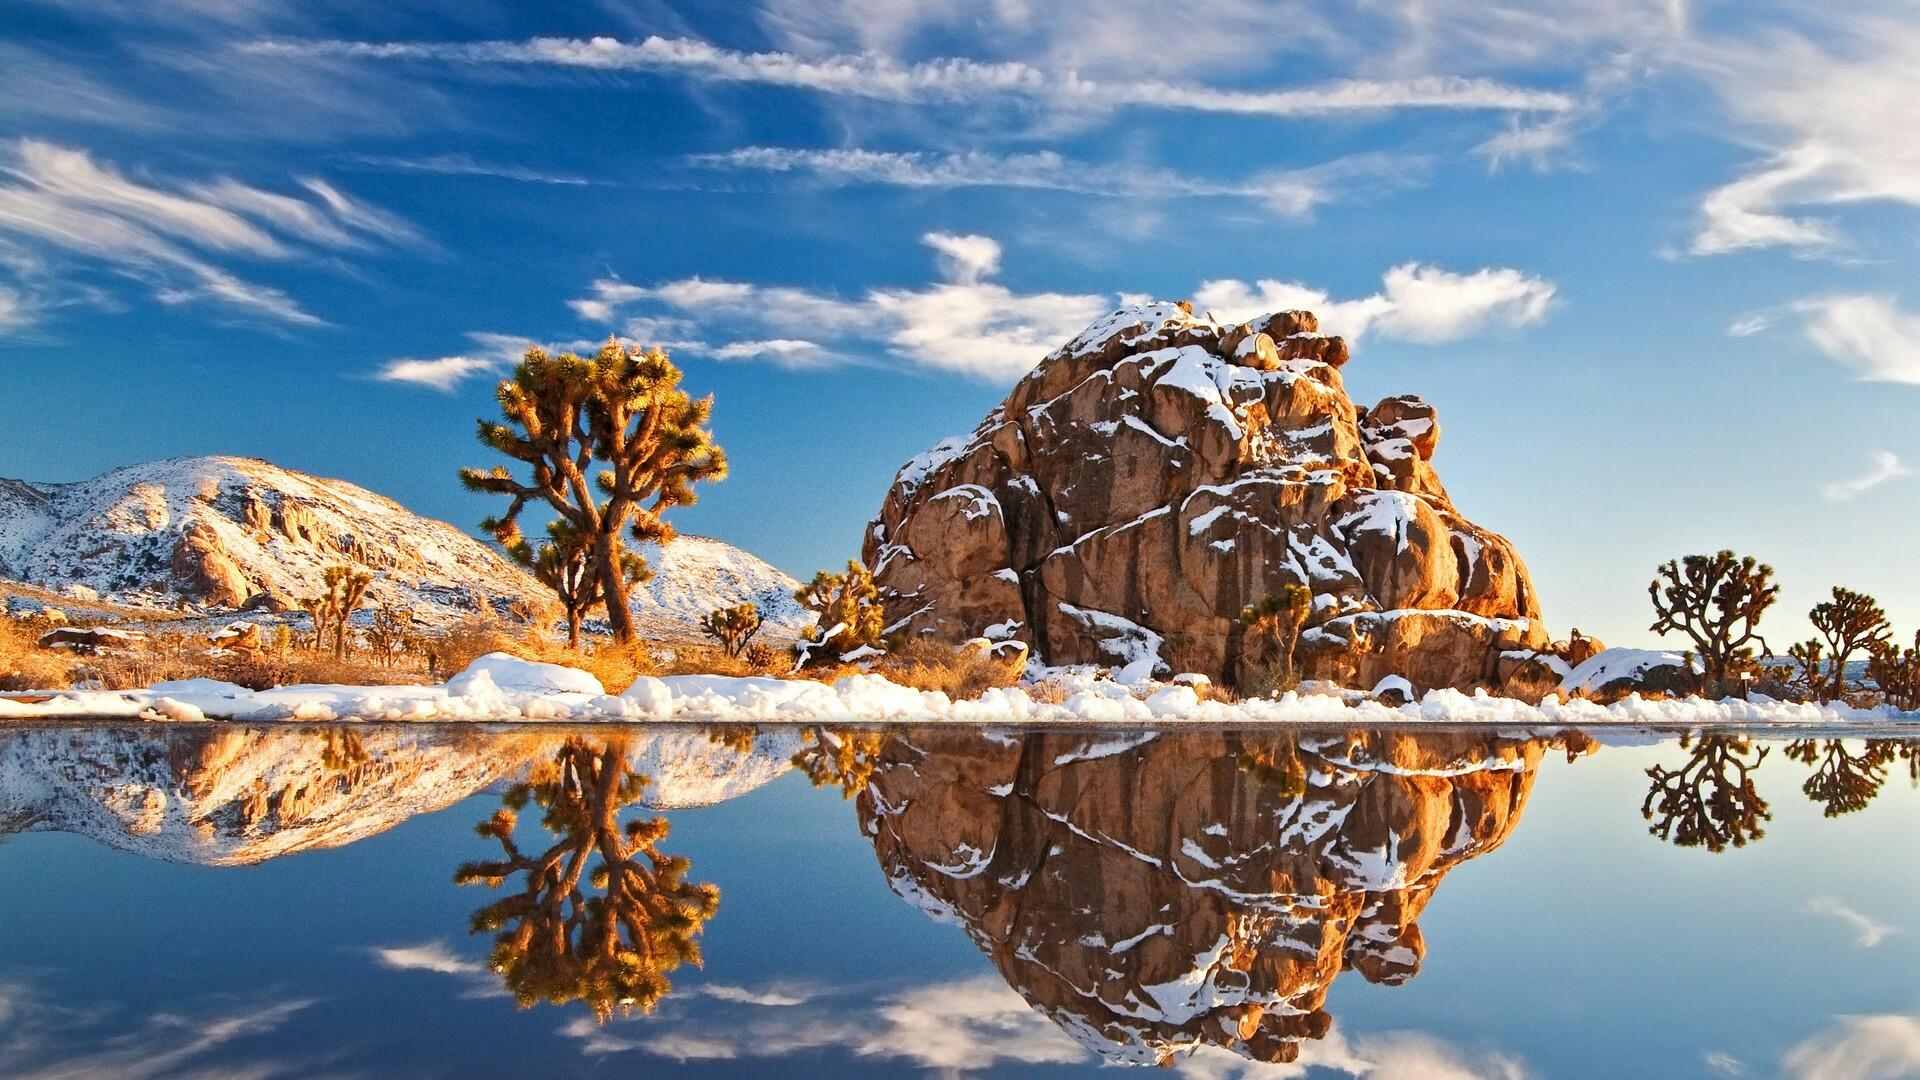 The original photograph of the landscape